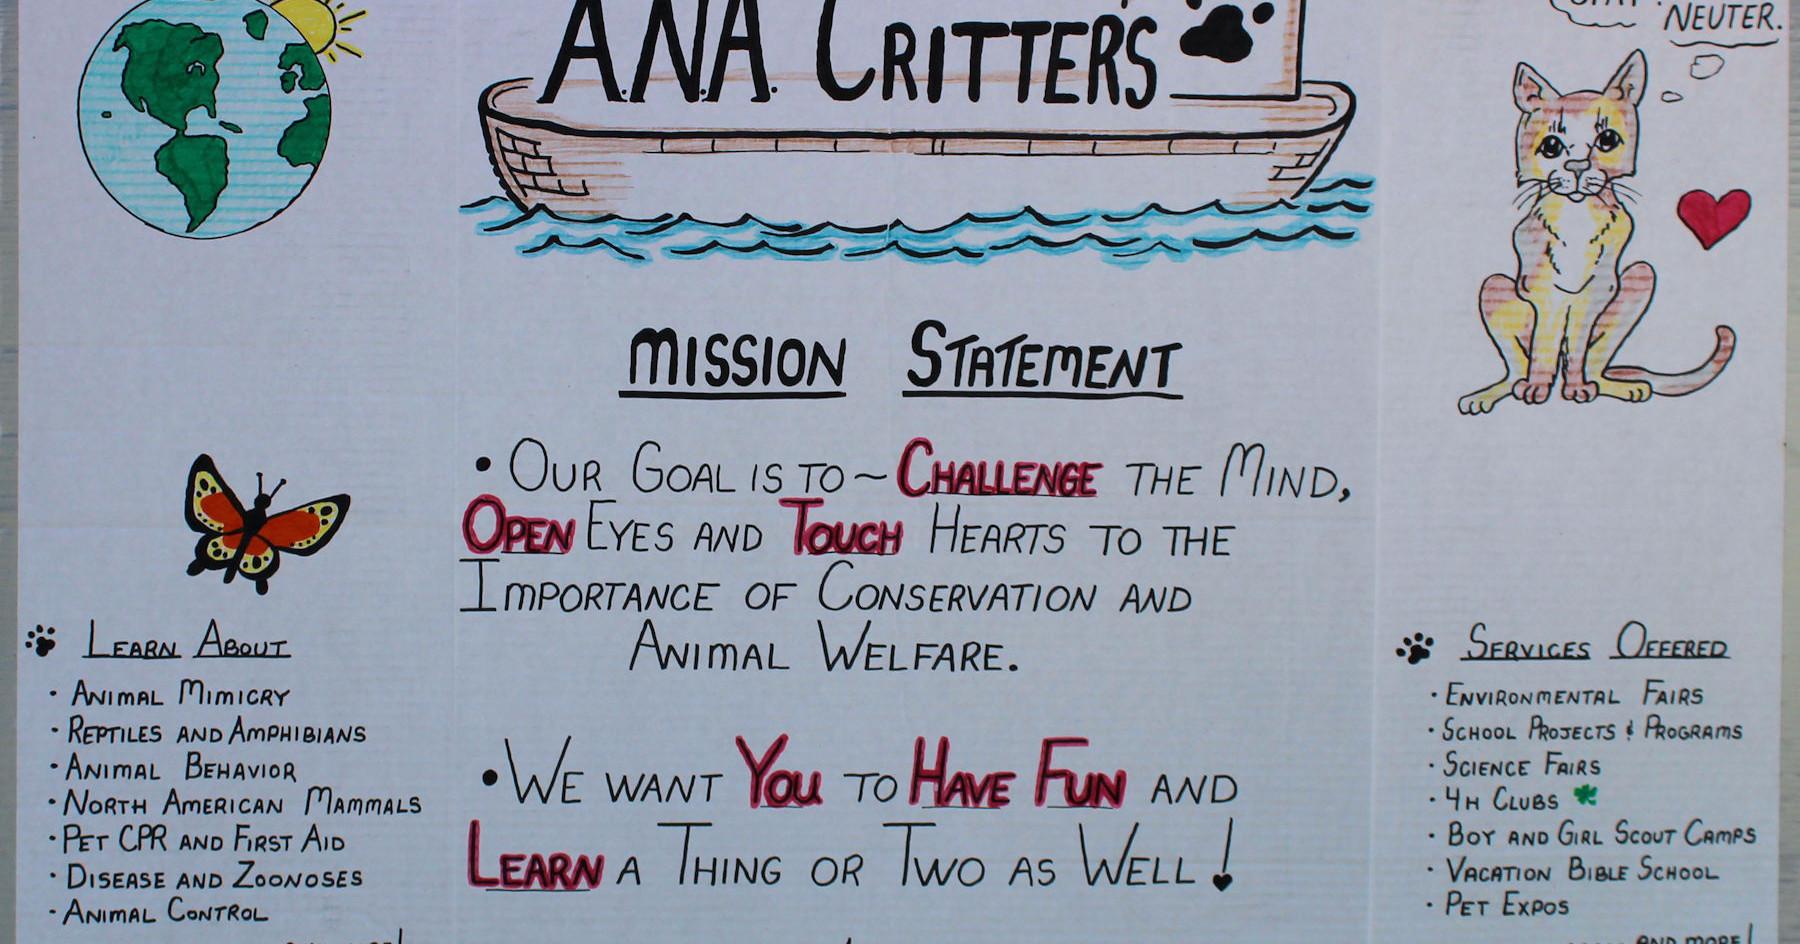 ANA CRITTERS